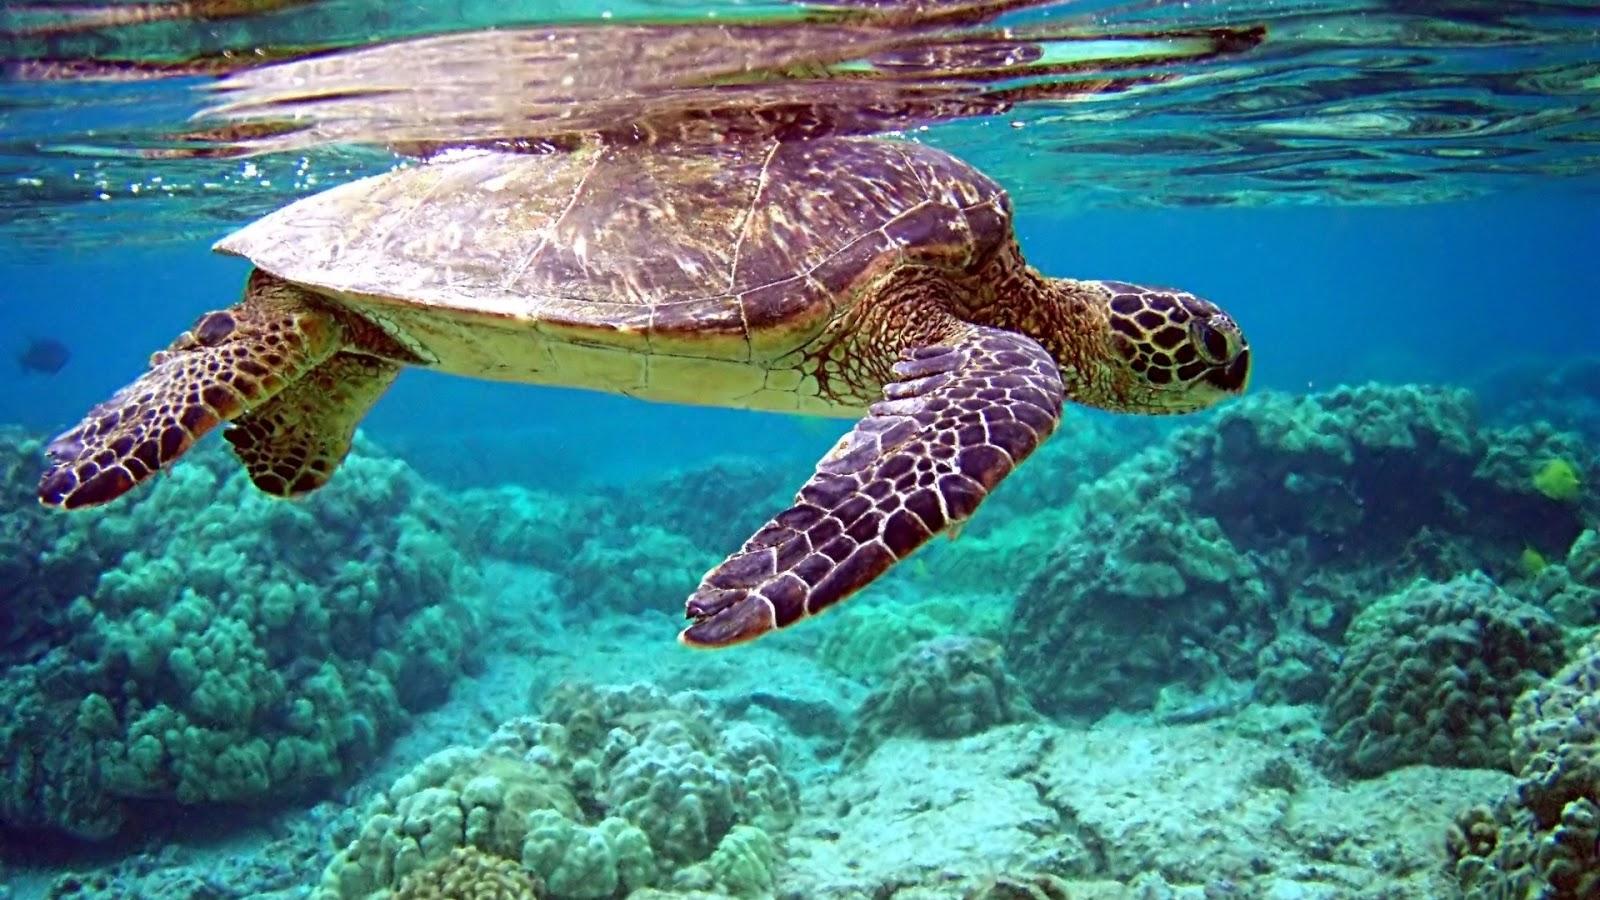 http://3.bp.blogspot.com/-uLKNopIwUzQ/UHa7r07ufdI/AAAAAAAAGmc/3tY9dUshElc/s1600/Sea_Turtle_Wallpaper_6.jpg